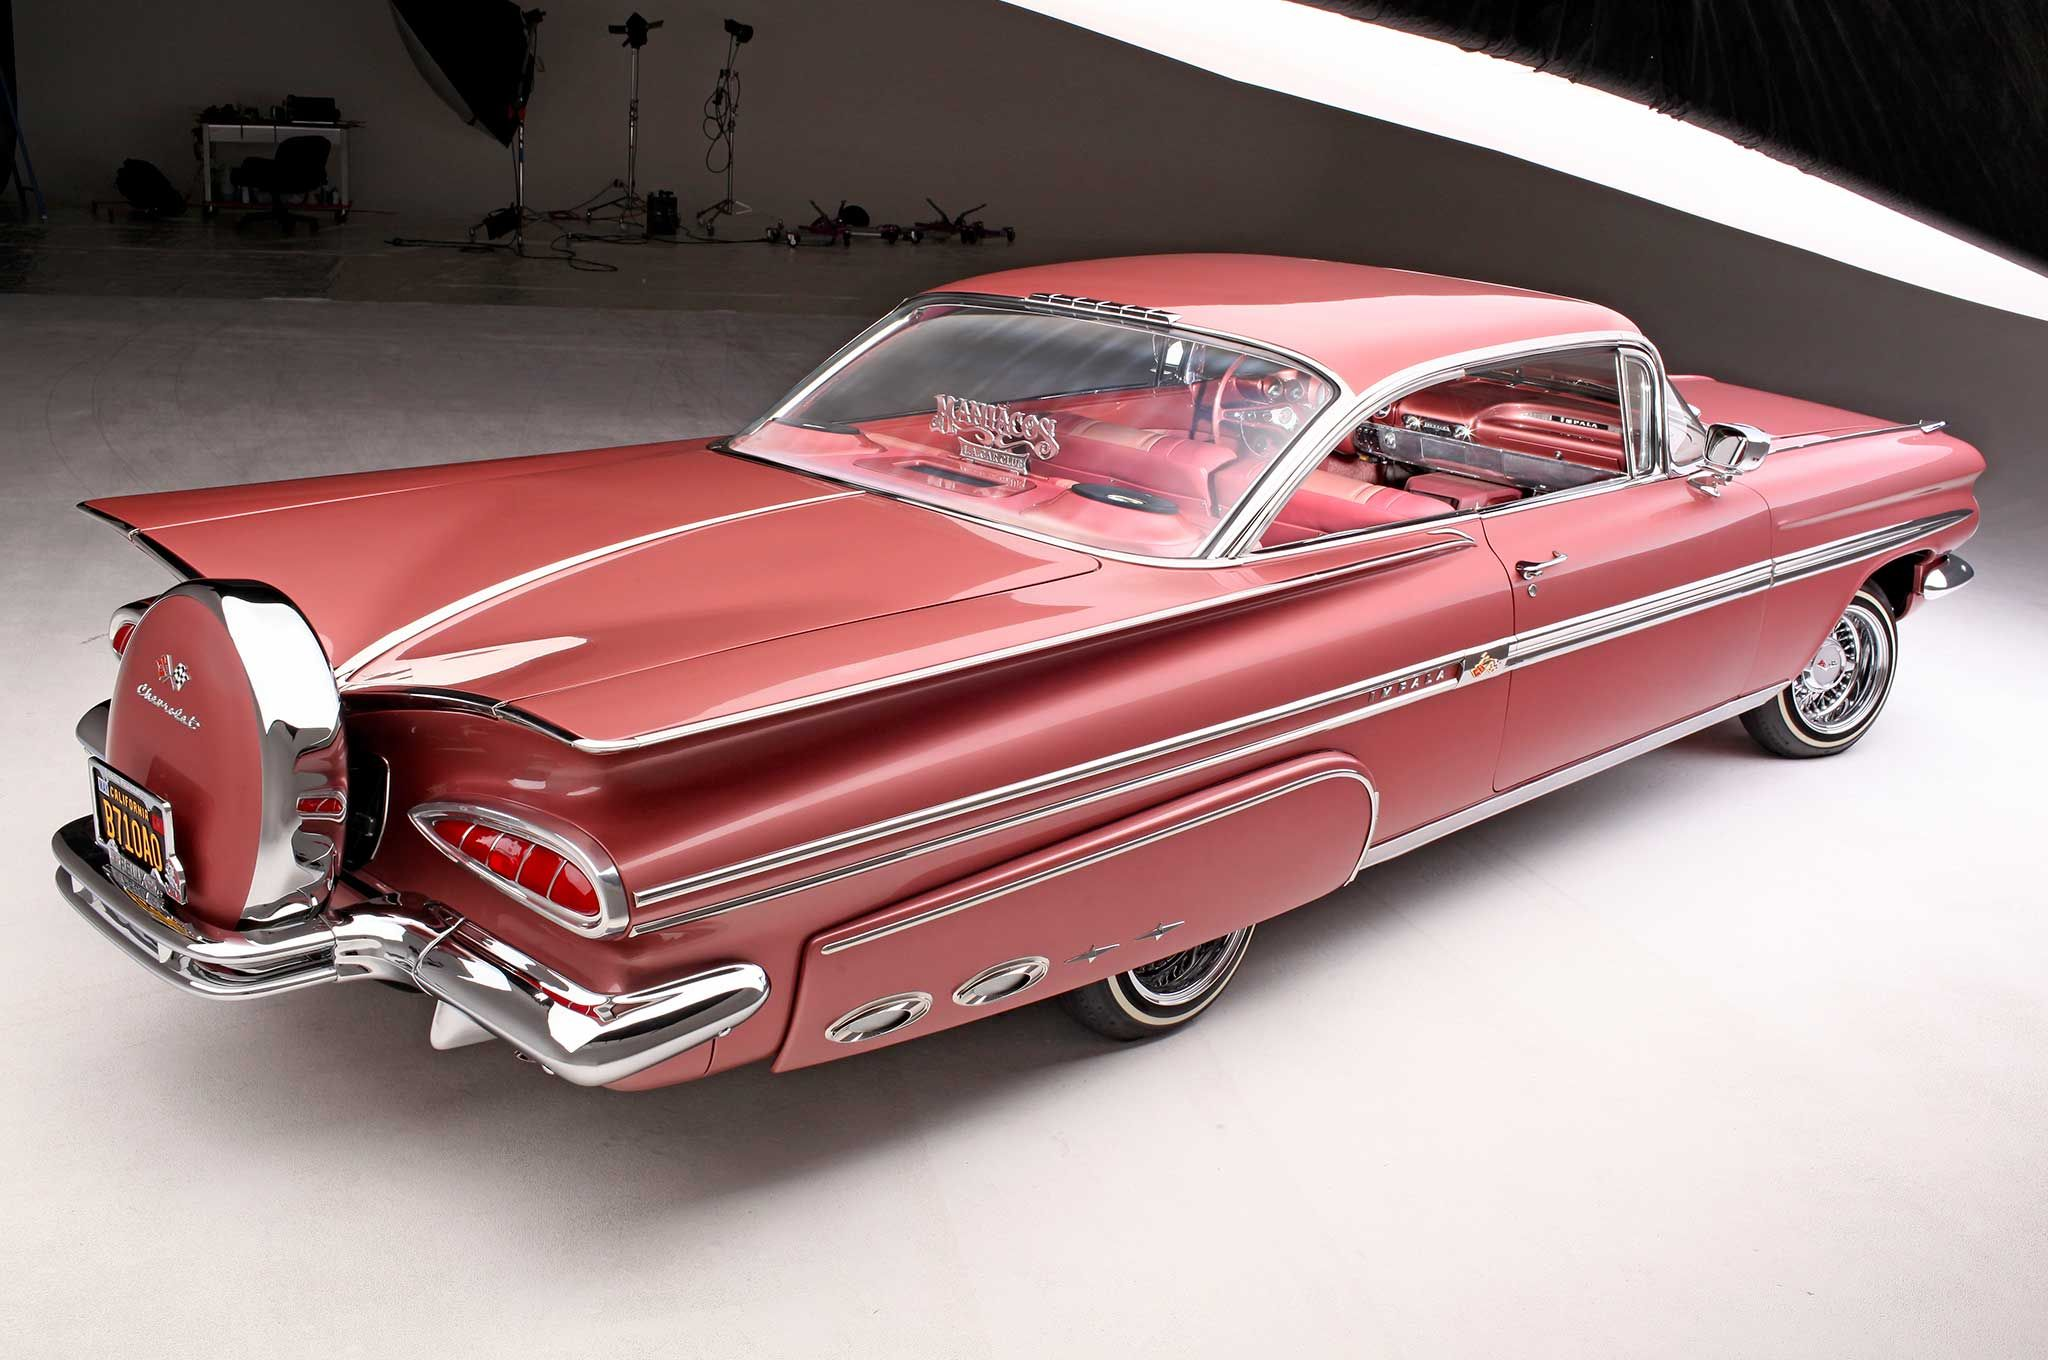 hight resolution of 1959 chevrolet impala passenger side rear quarter view 014